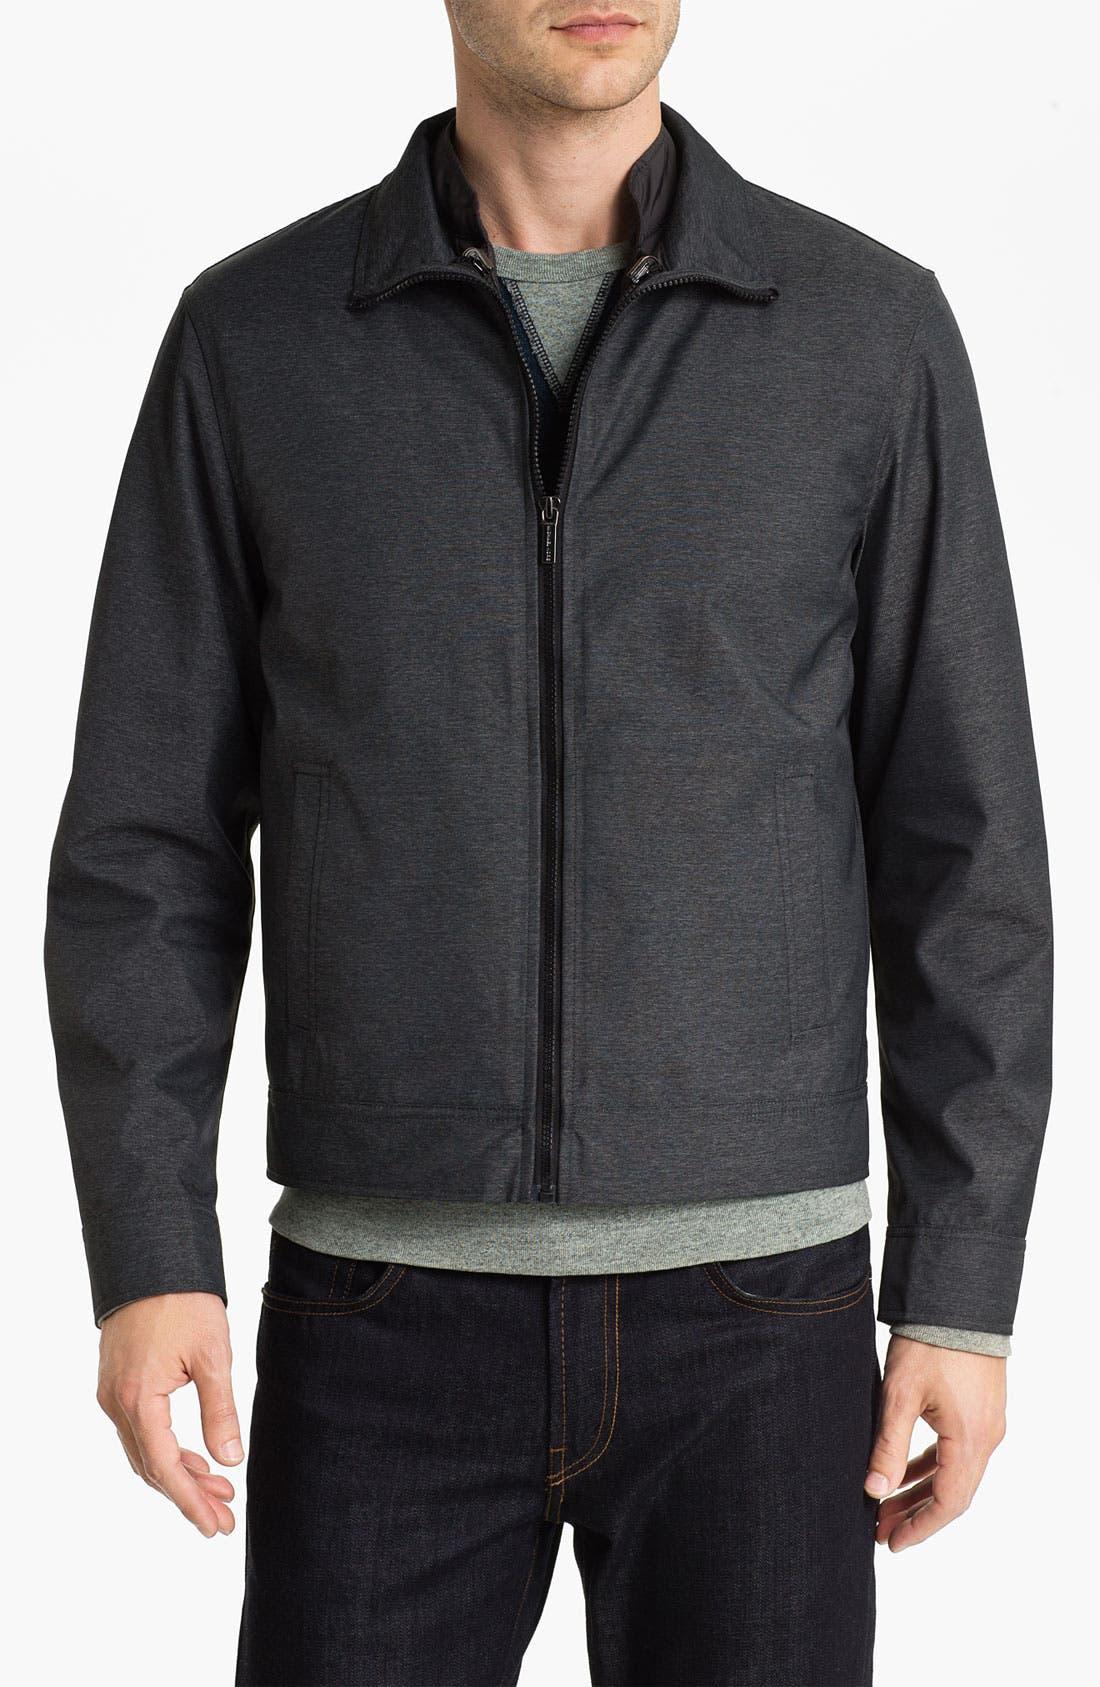 Main Image - Michael Kors 3-in-1 Mélange Twill Jacket (Online Exclusive)